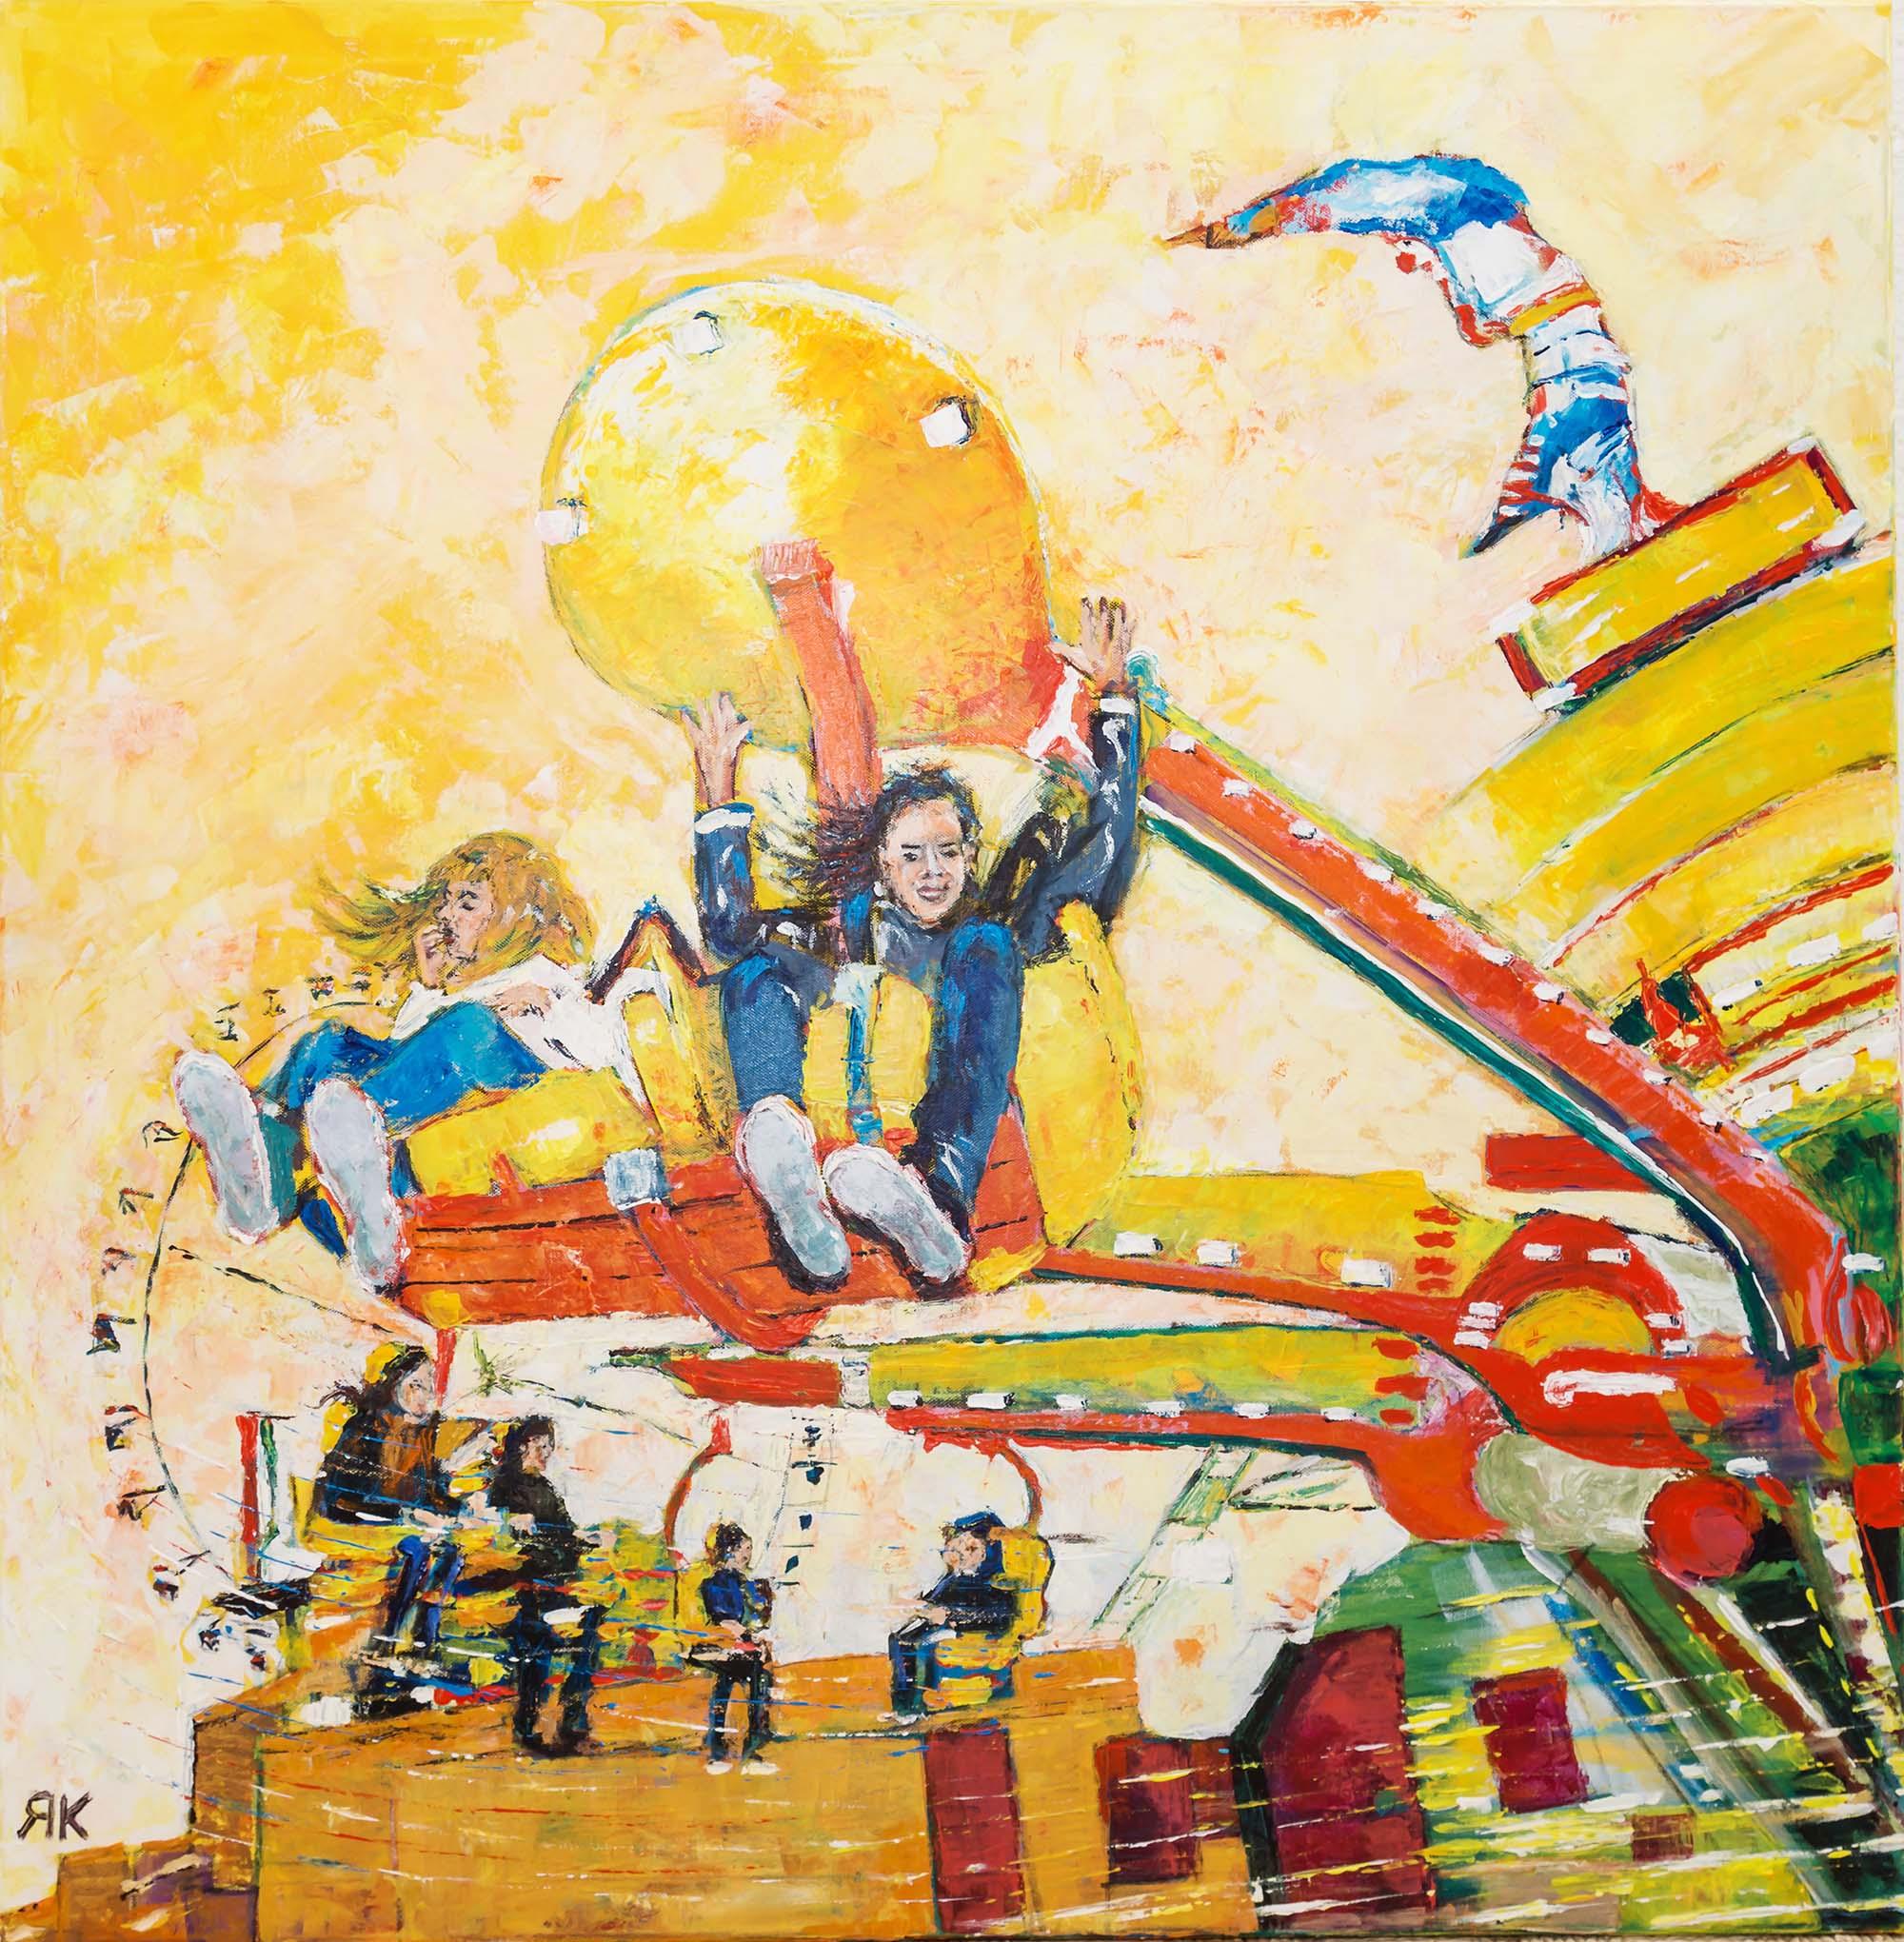 Amusement park movements by Ria Kieboom